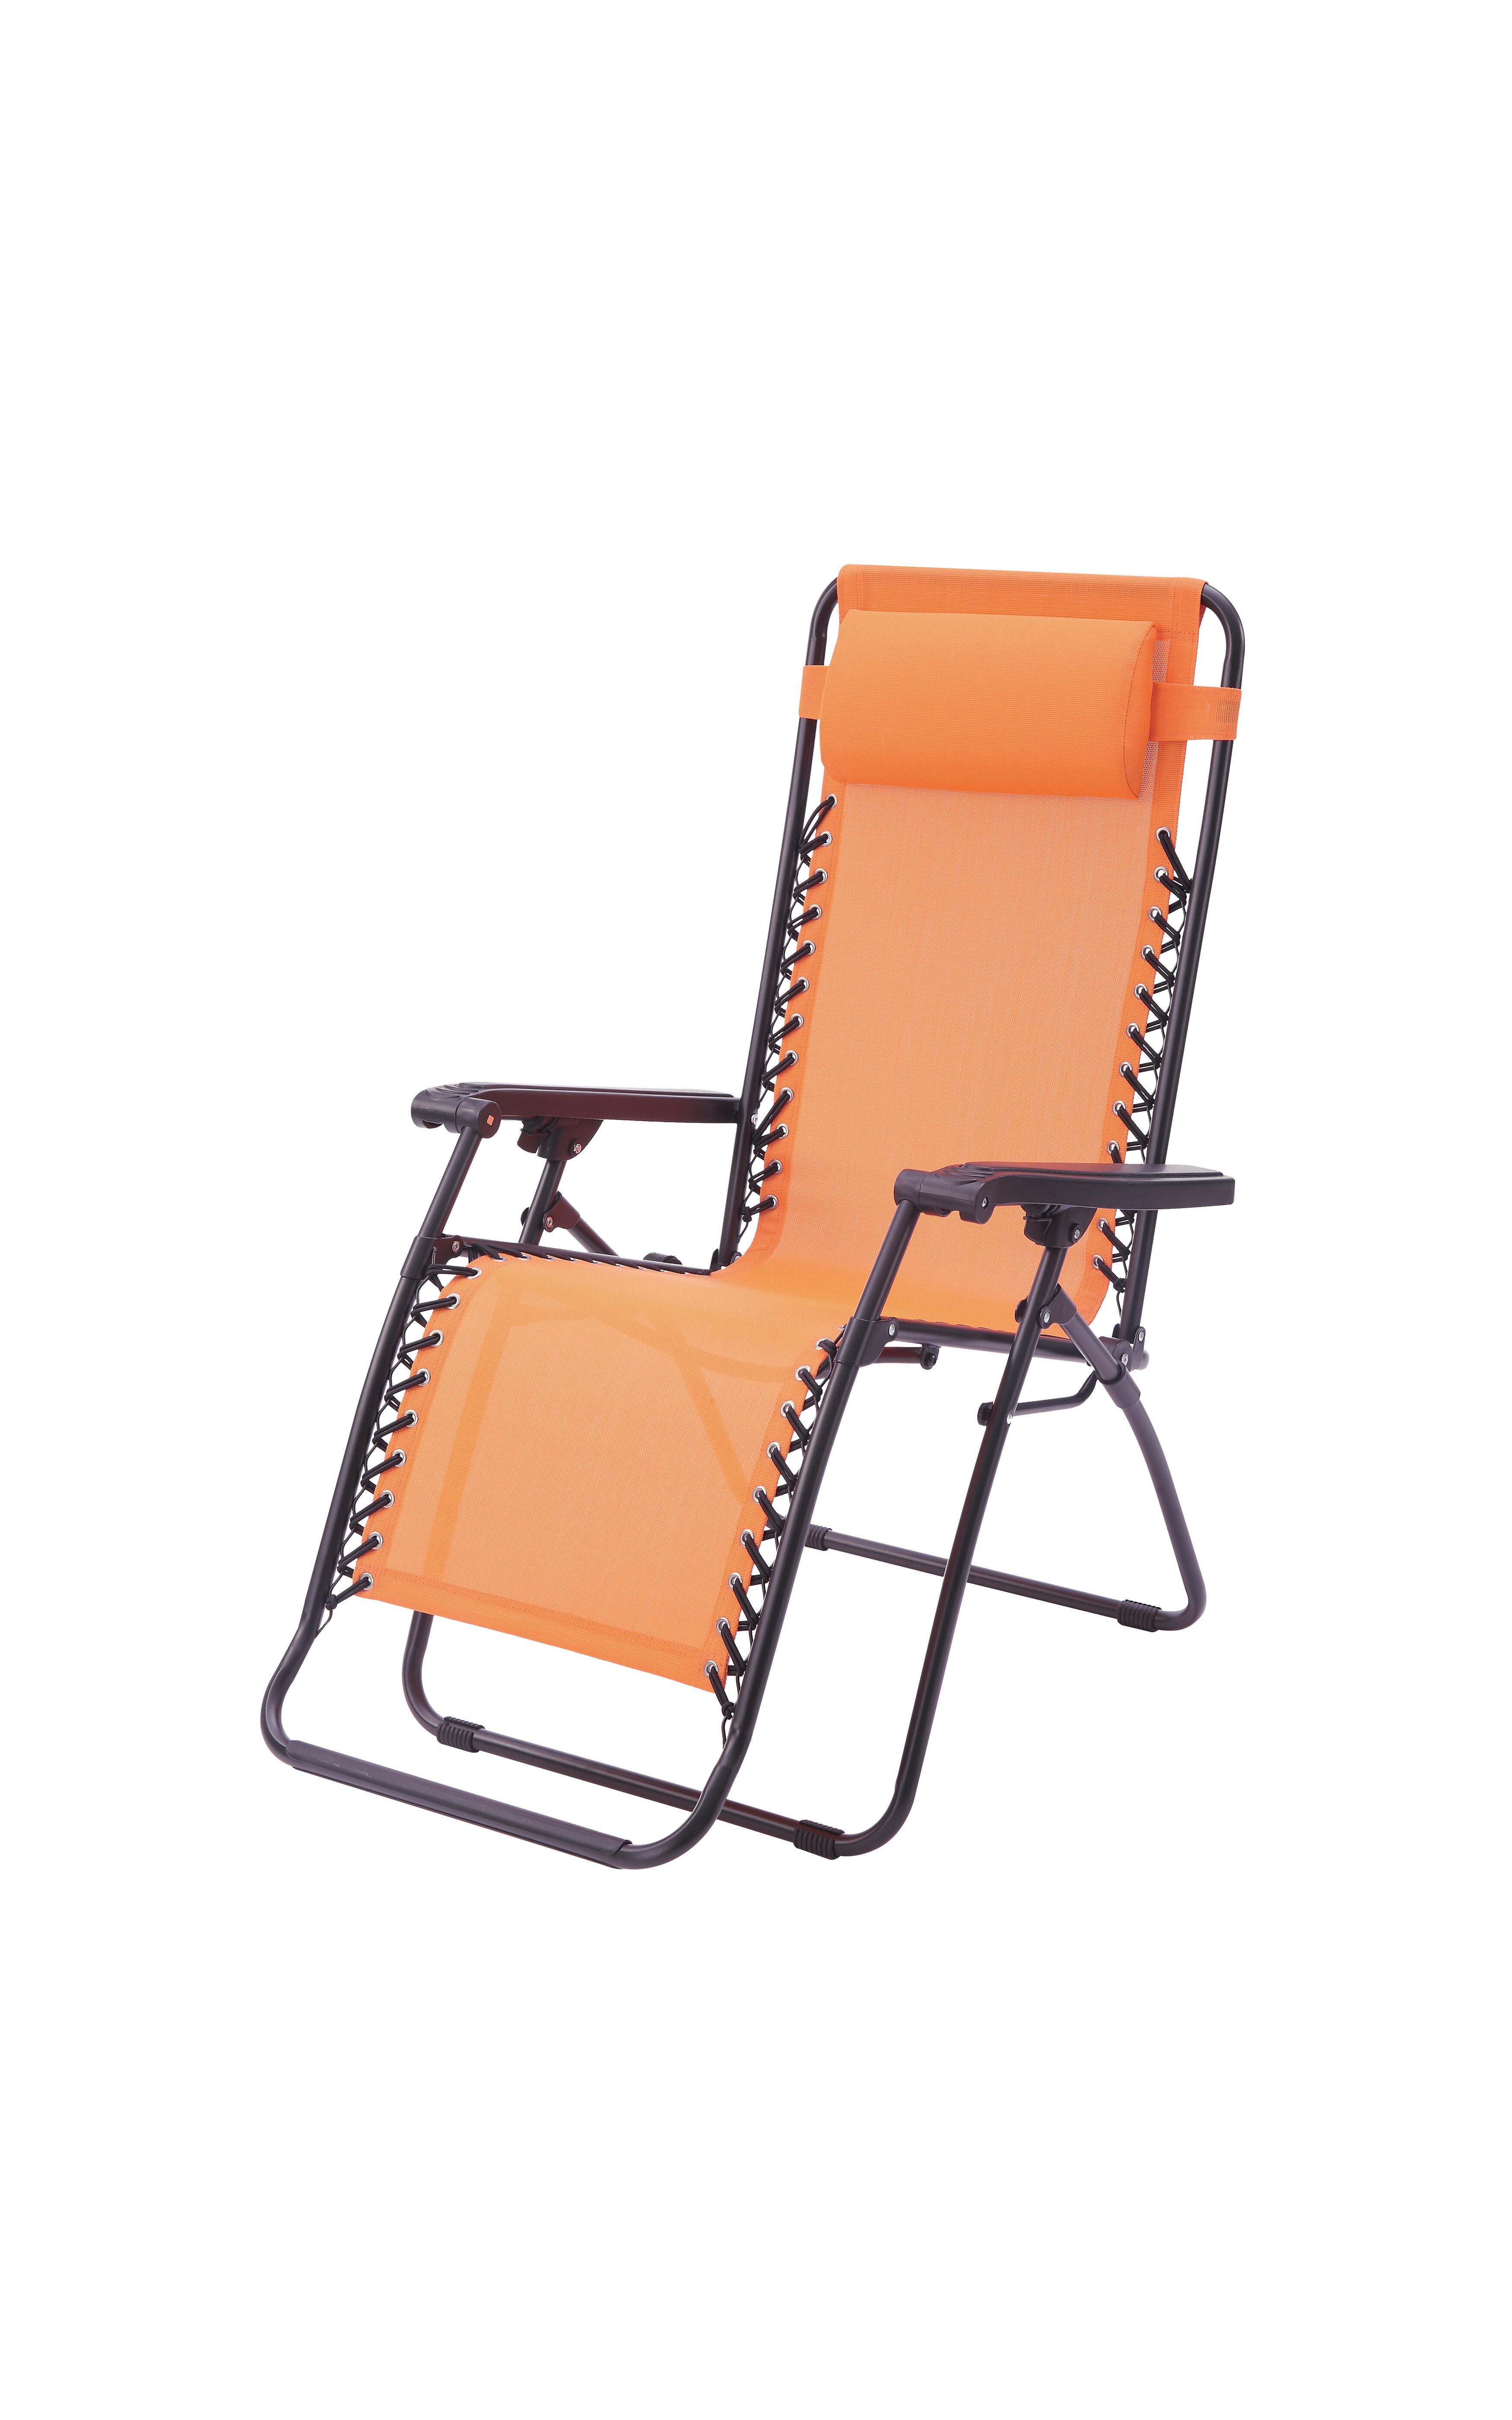 Poundex Lizkona Gavin Zero Gravity Patio Lounge Chair with Cushion